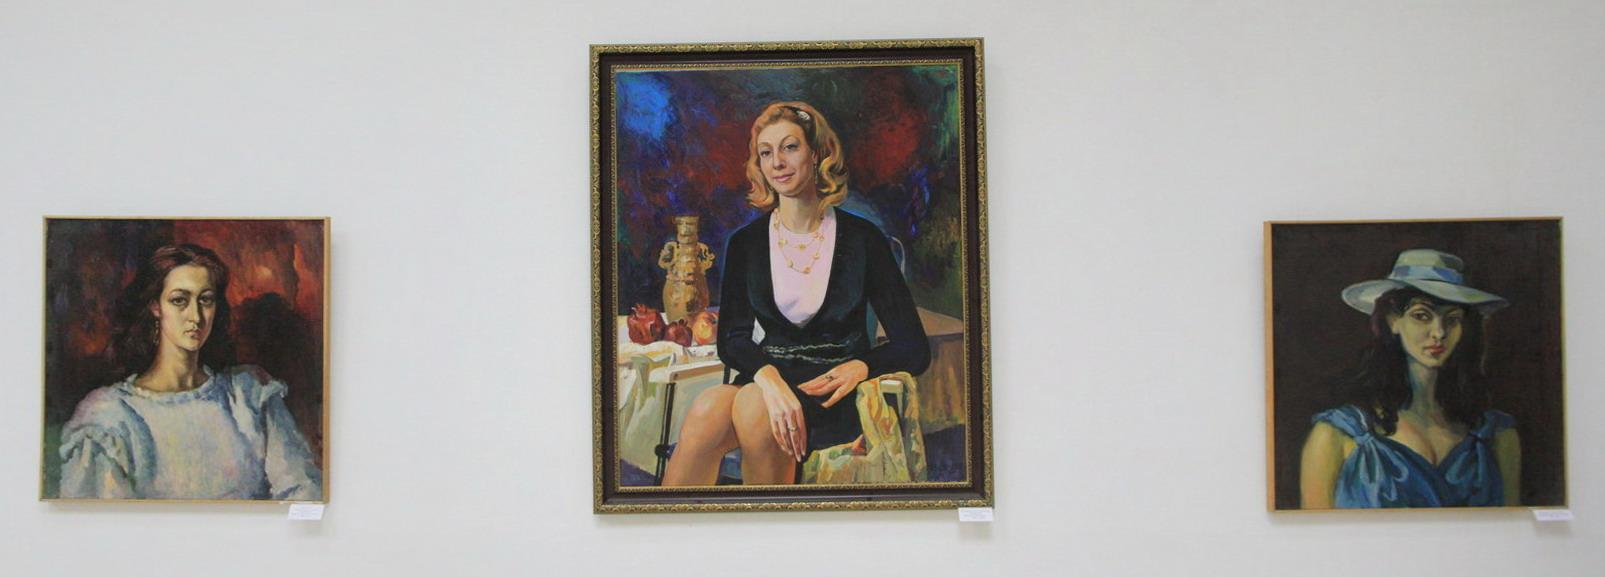 Экспозиция картин Бурмакина В.